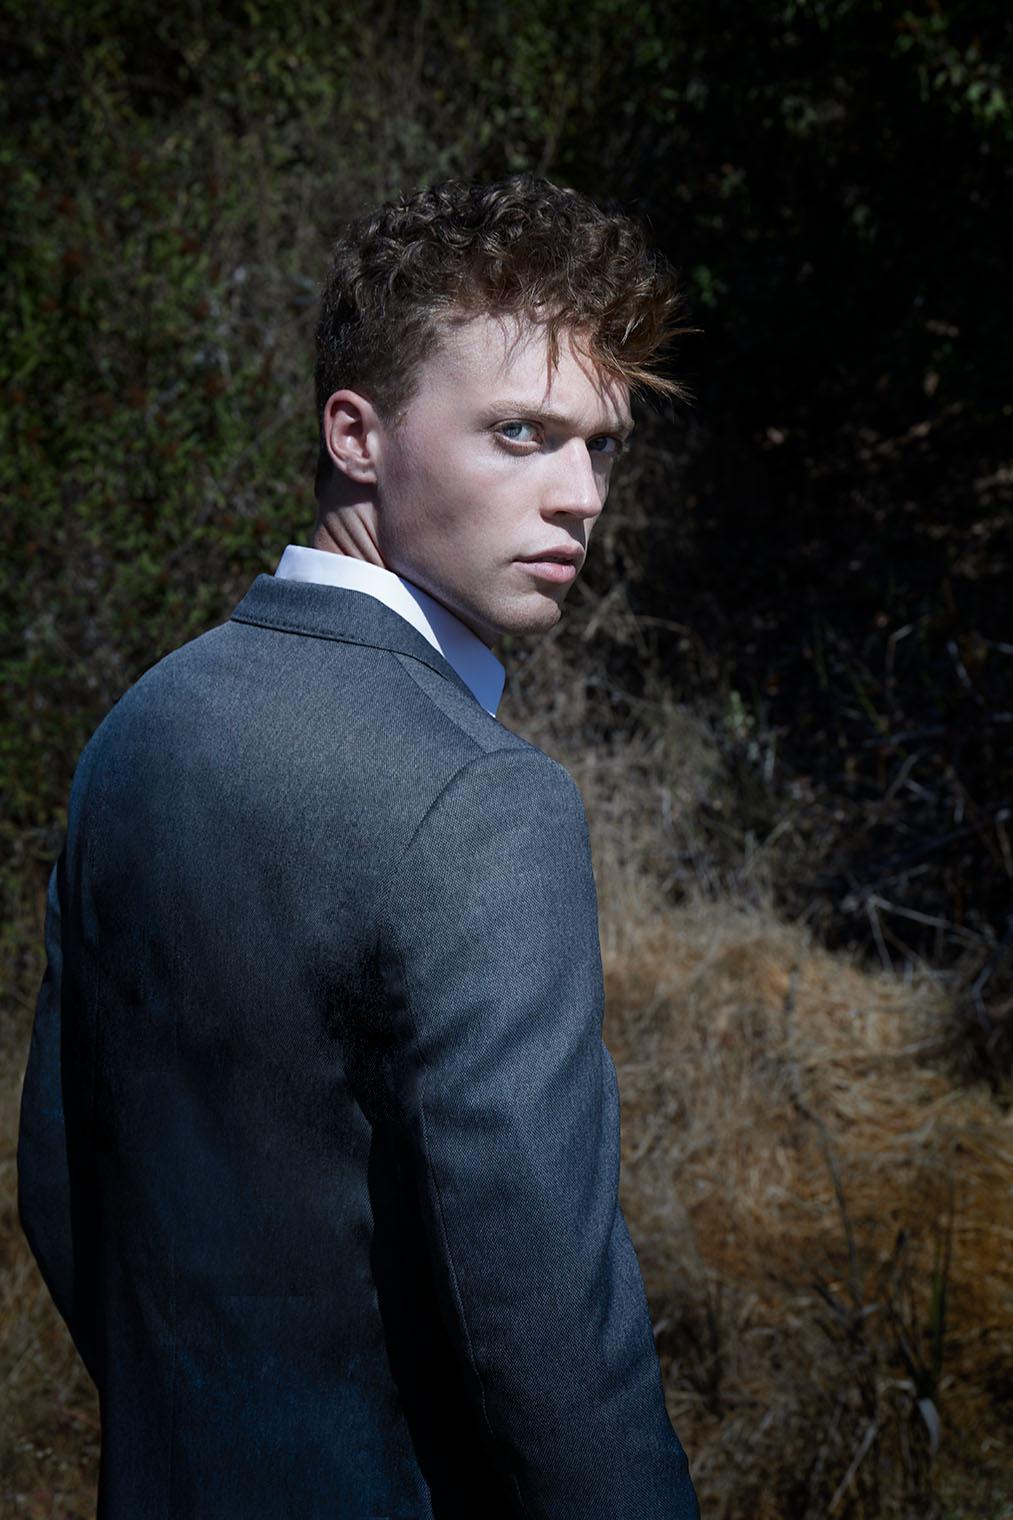 man in elegant suit in California nature - fashion photographer Robert Wilde, Los Angeles